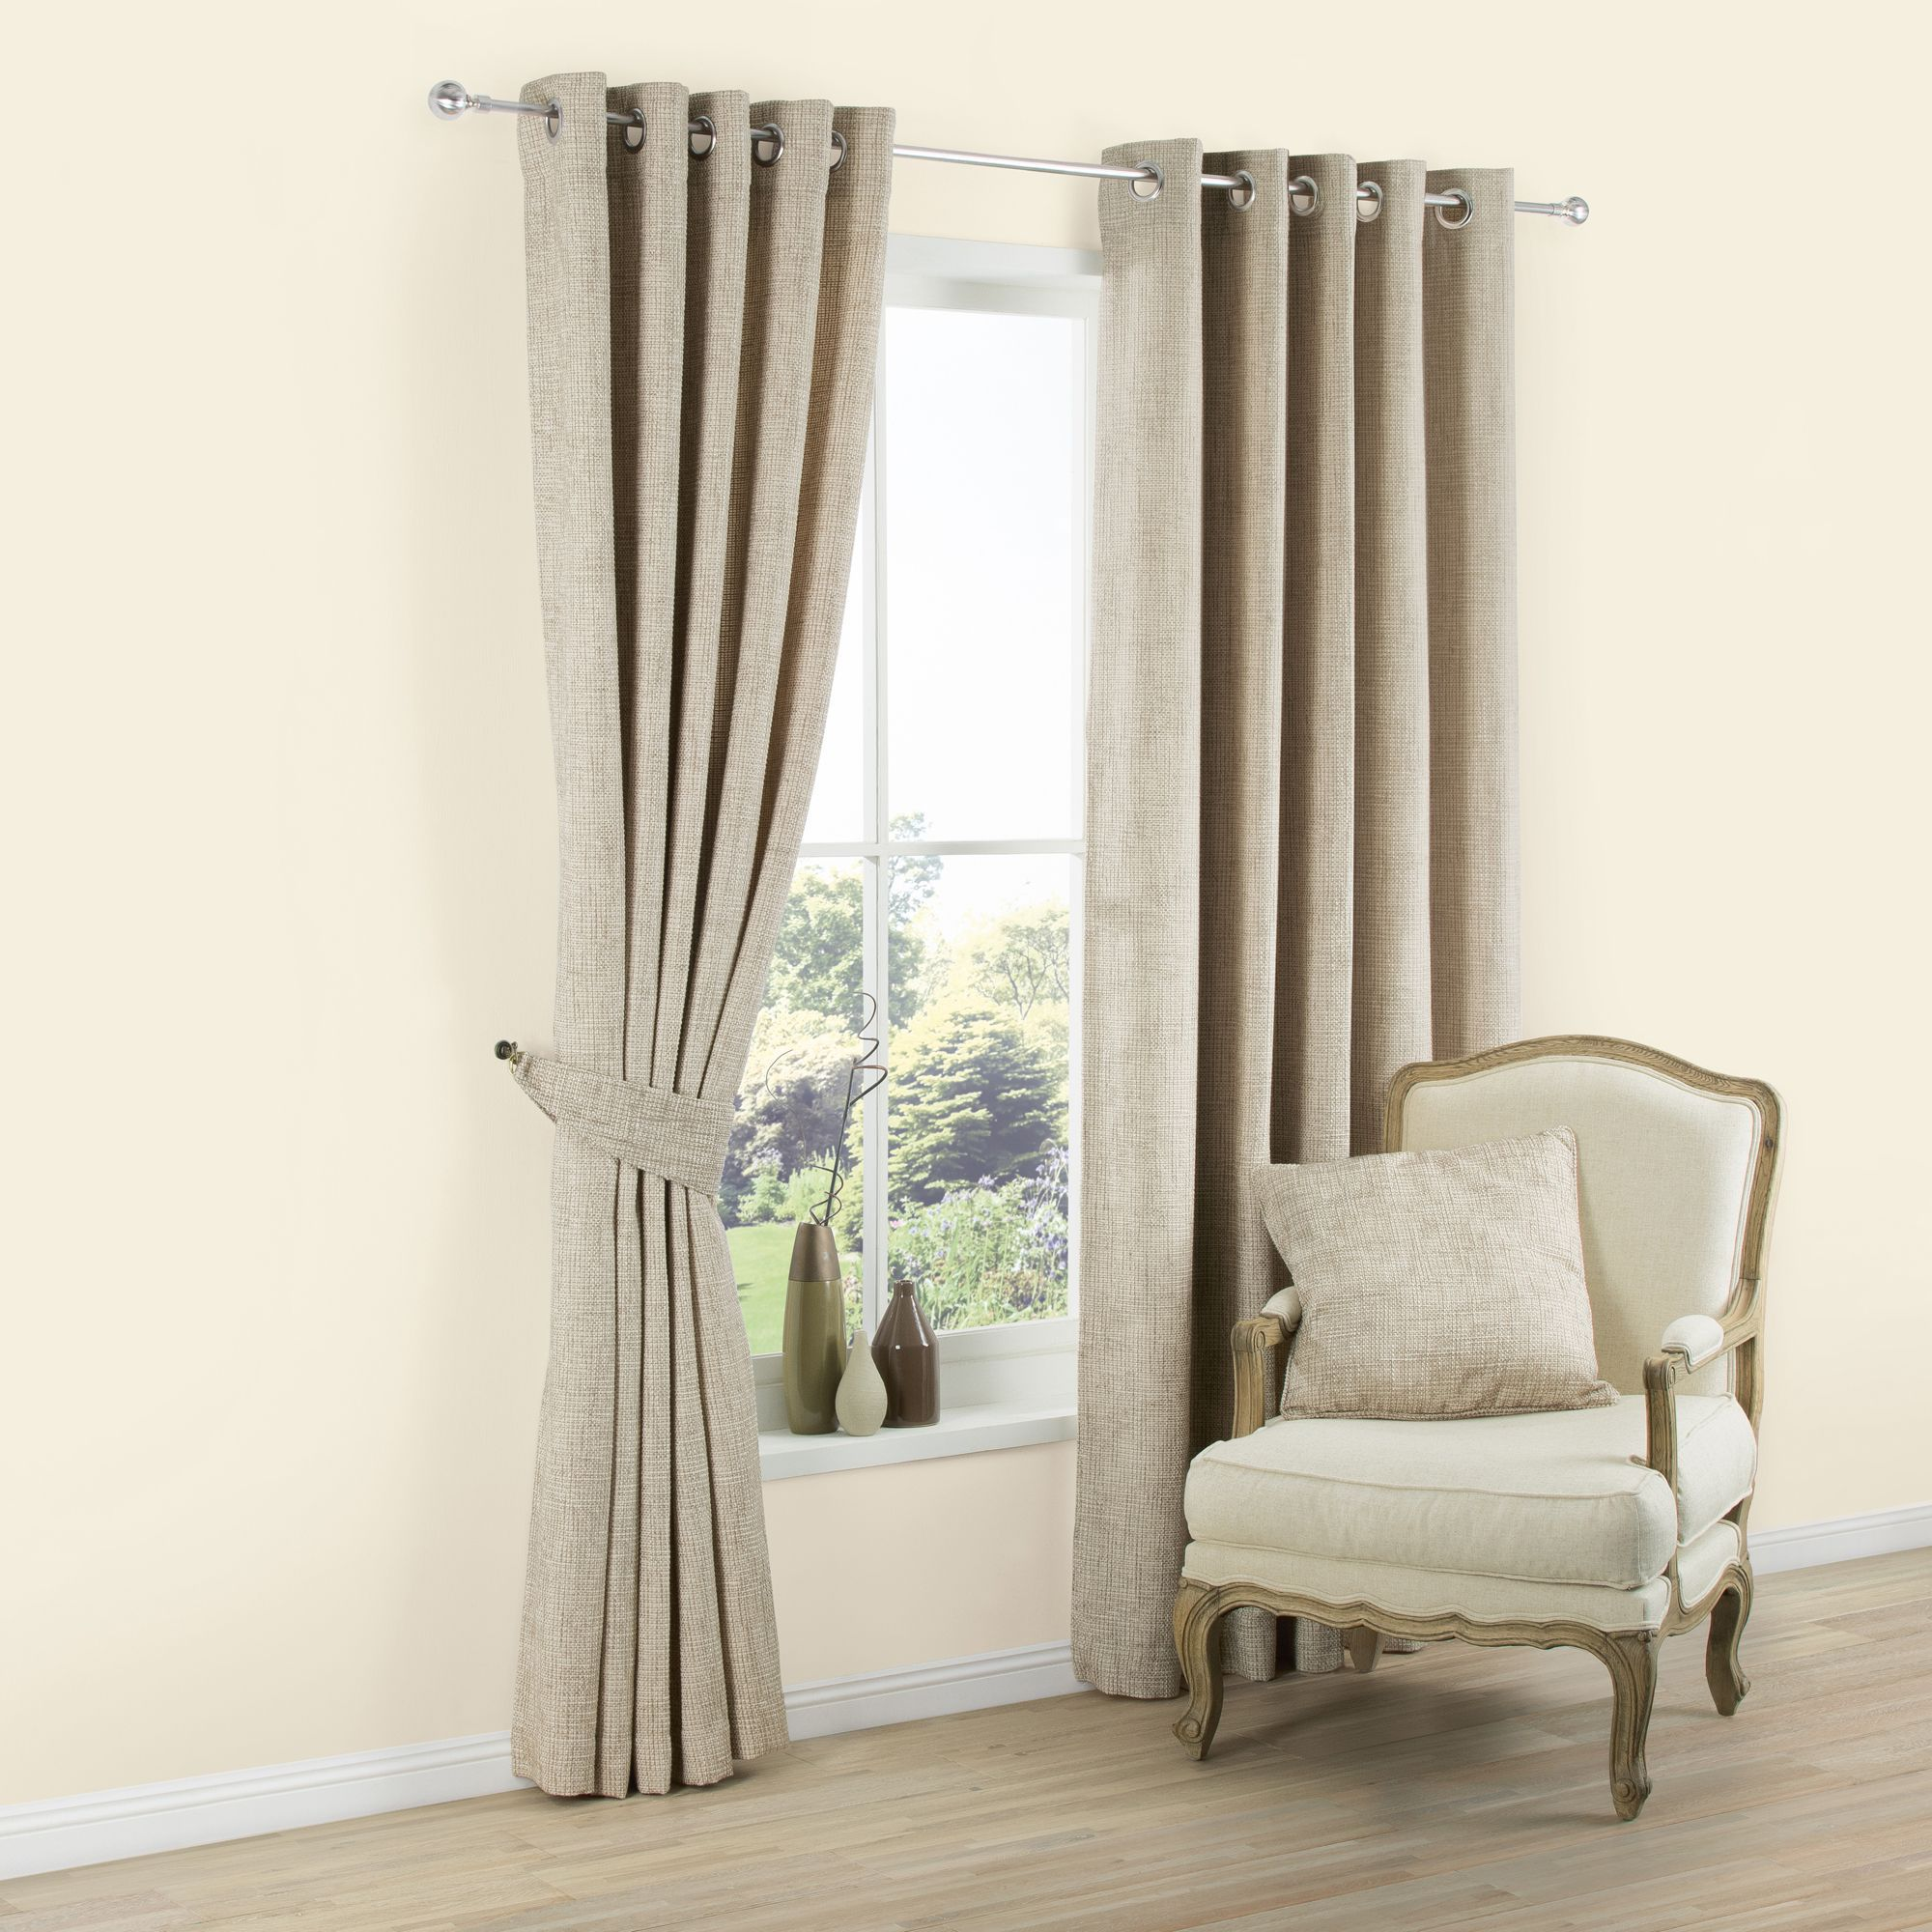 Carina Ecru & Seine Plain Woven Eyelet Lined Curtains (w)117 Cm (l)137 Cm